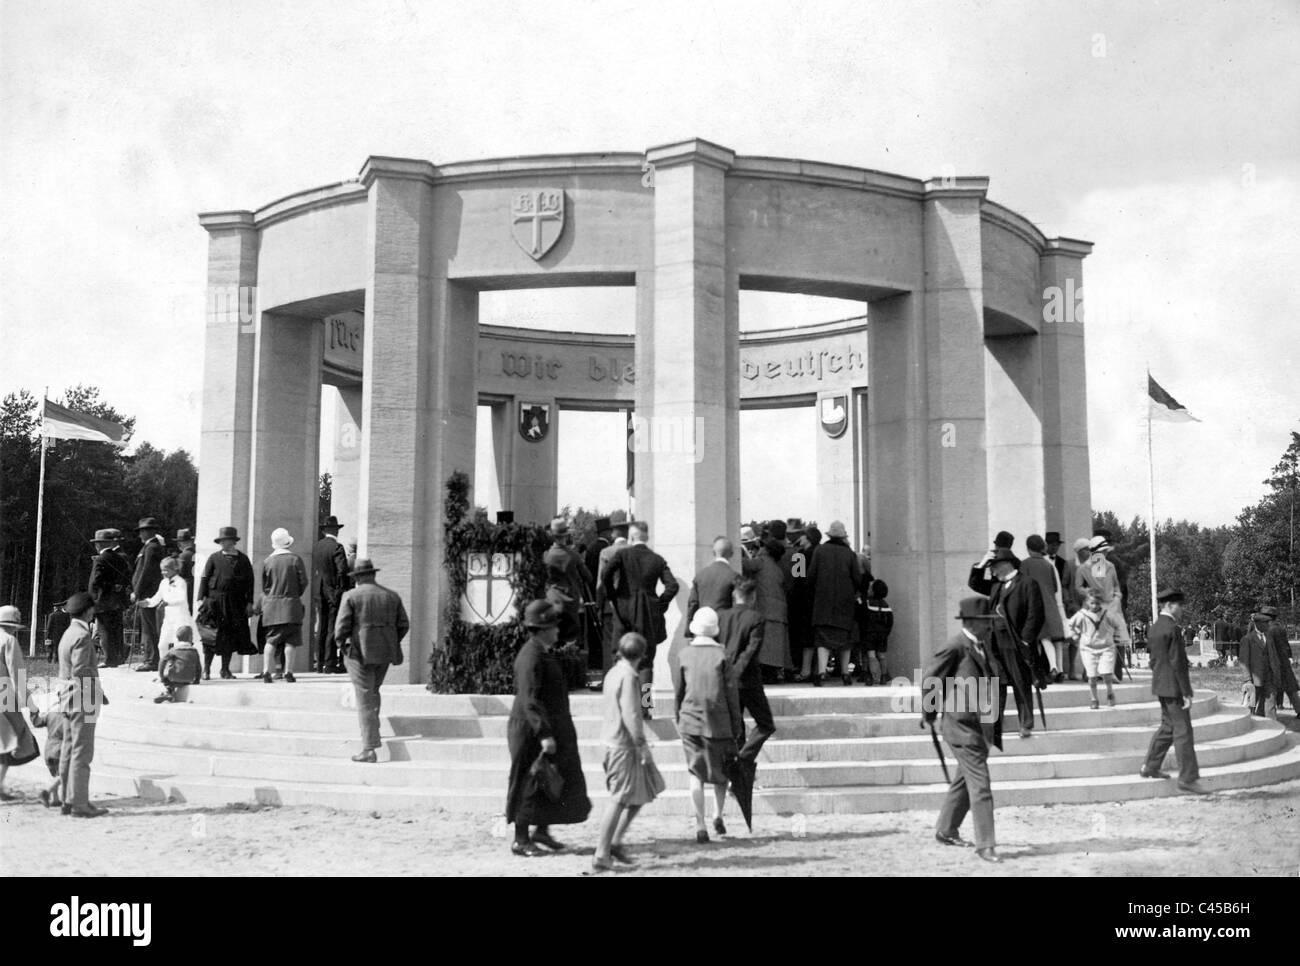 Voters Monument in Allenstein, today Olsztyn, 1939 - Stock Image